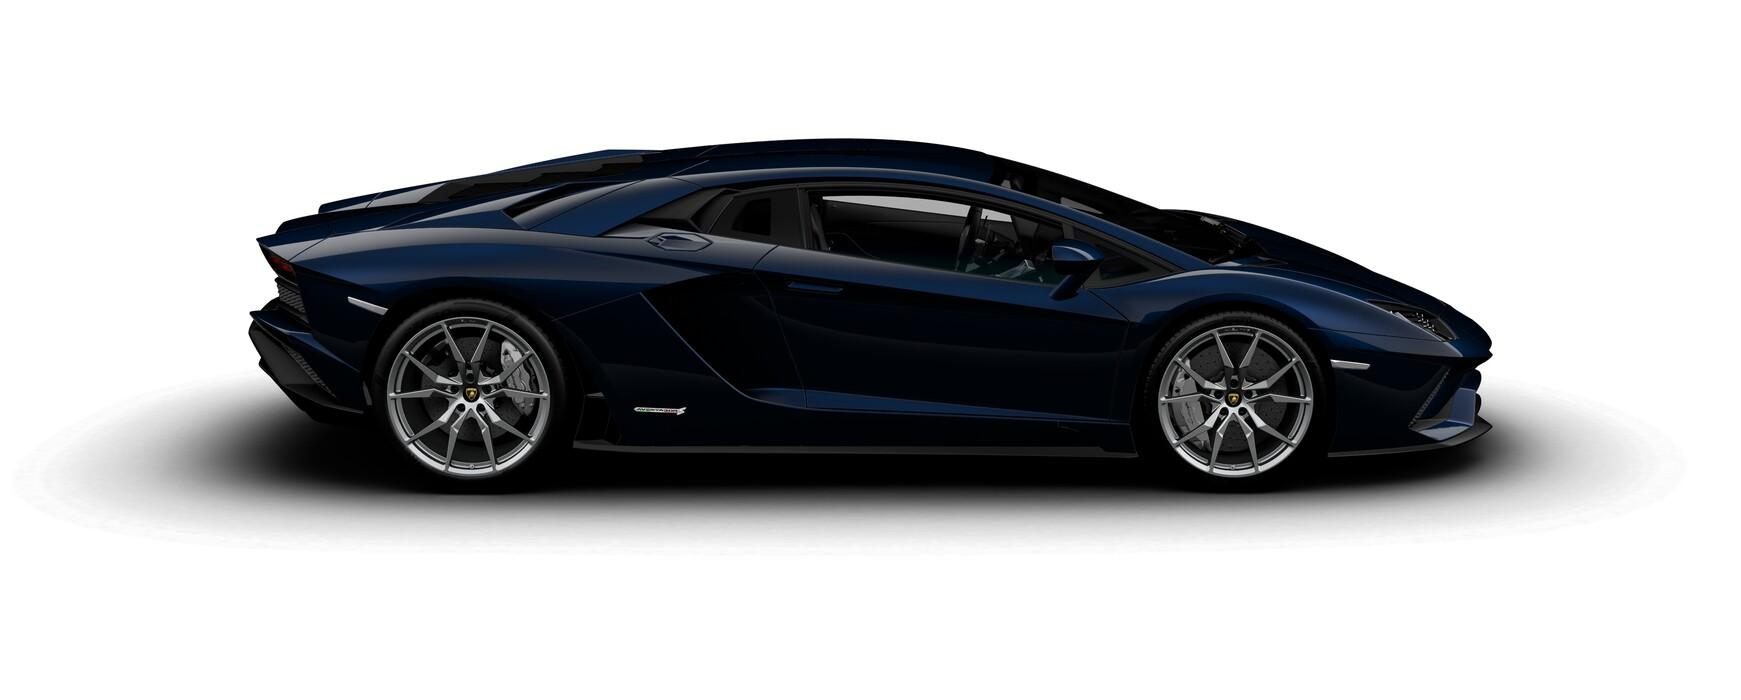 Lamborghini Aventador S Coupe metallic Blu Fontus side view